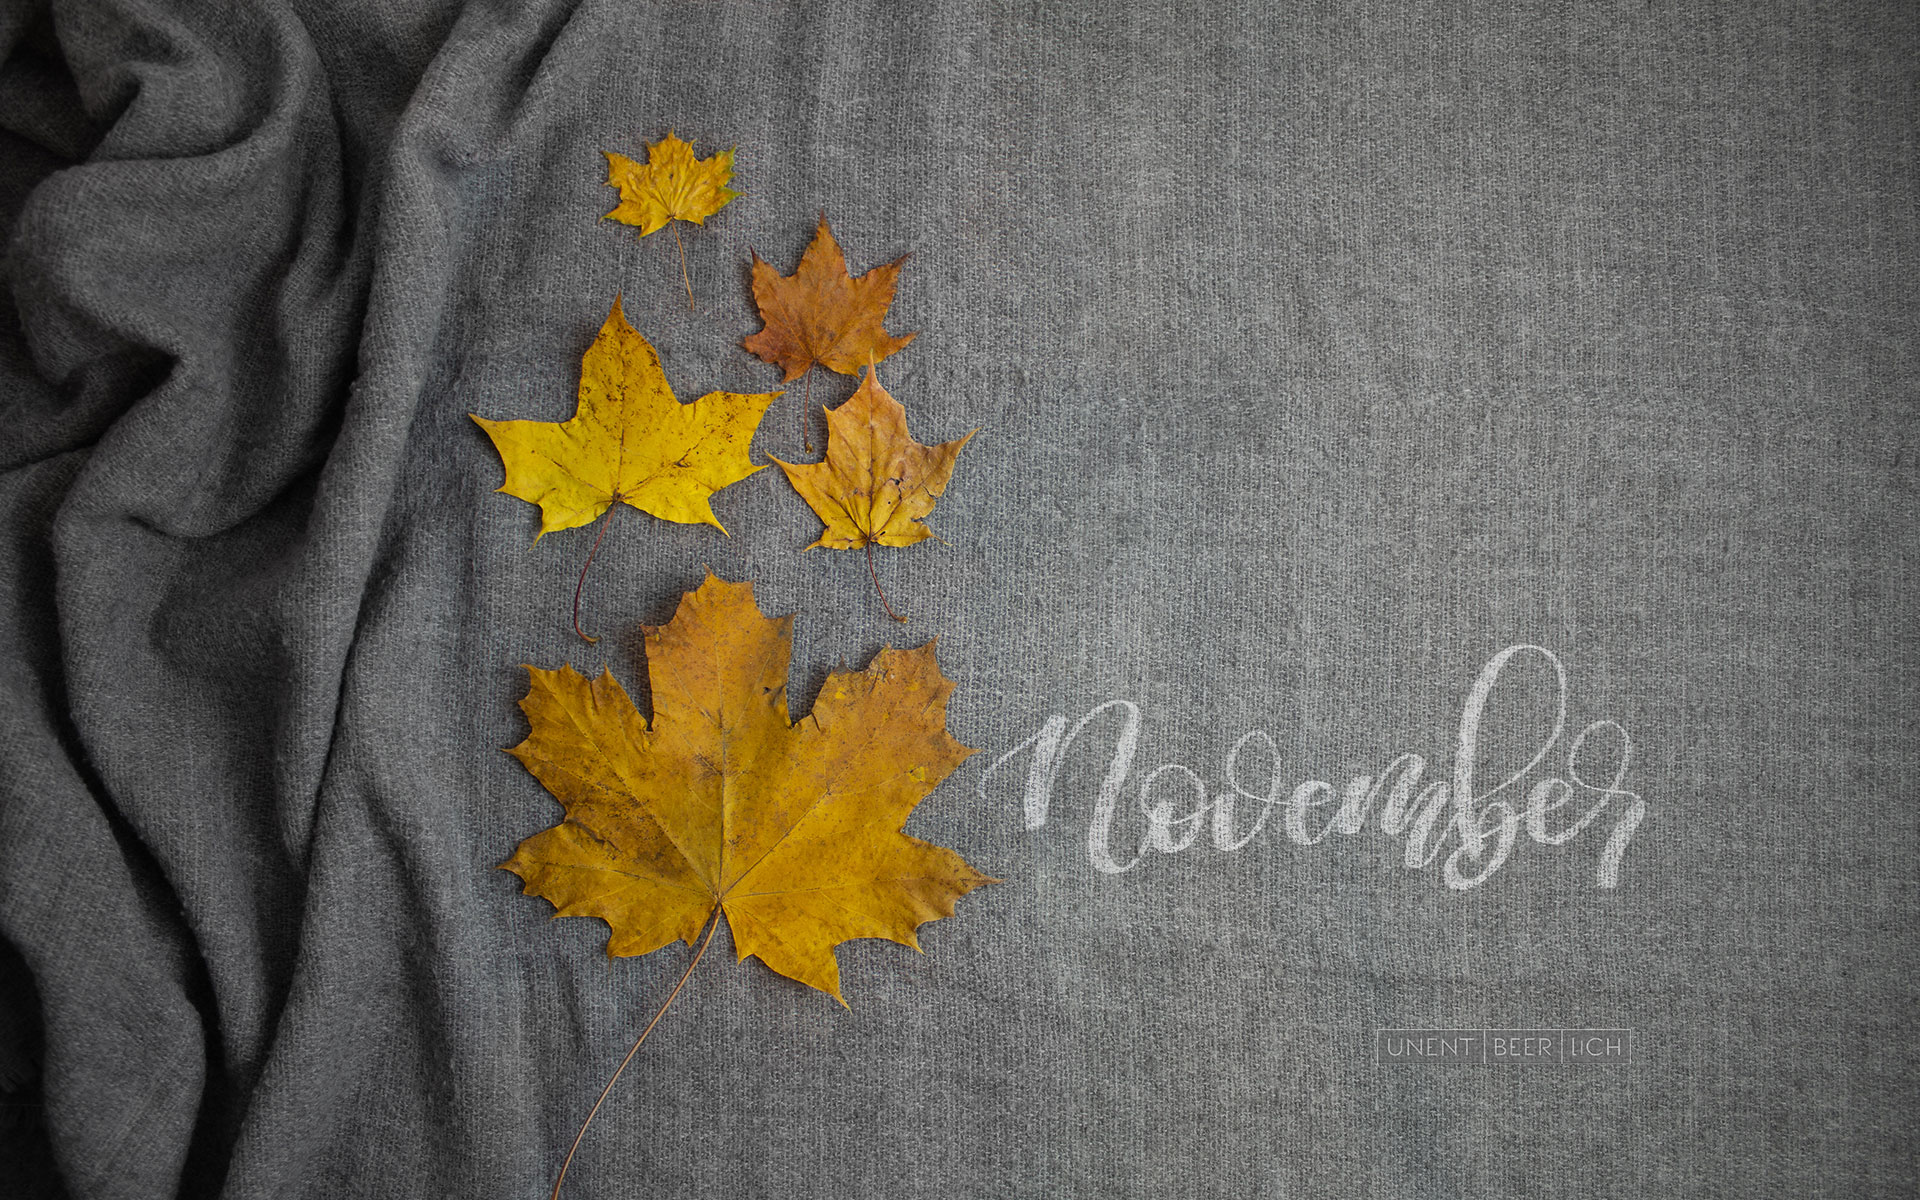 Wallpaper Computer November 19